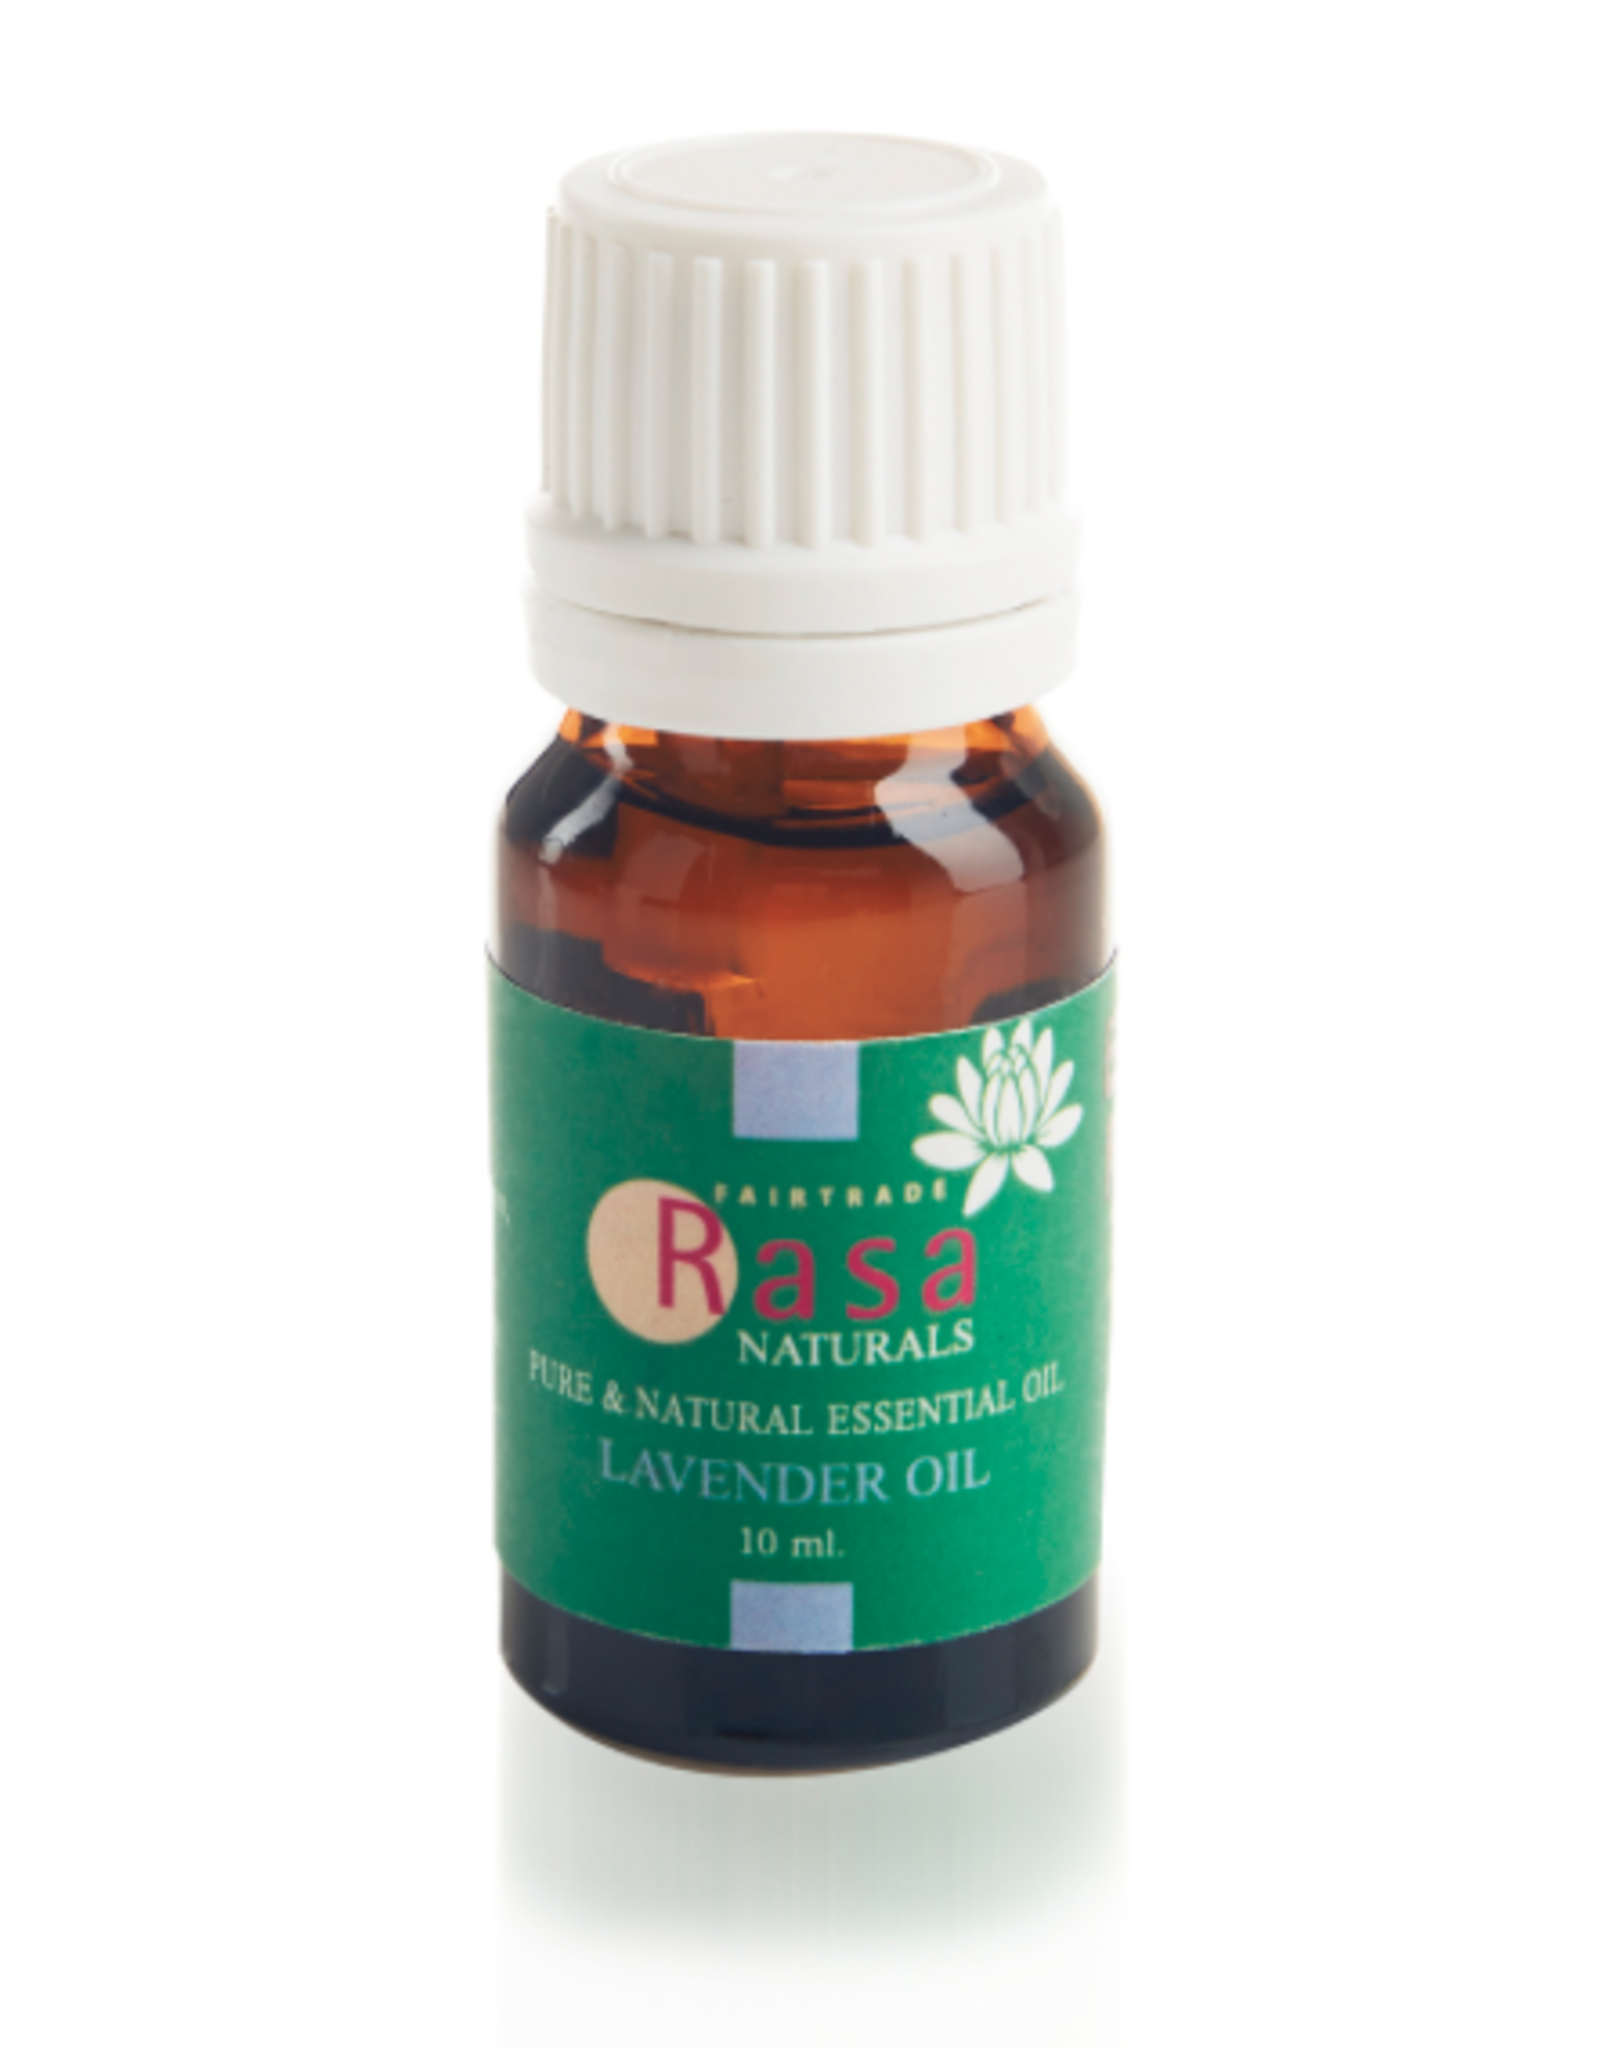 Rasa Natural Essential Oils Lavender